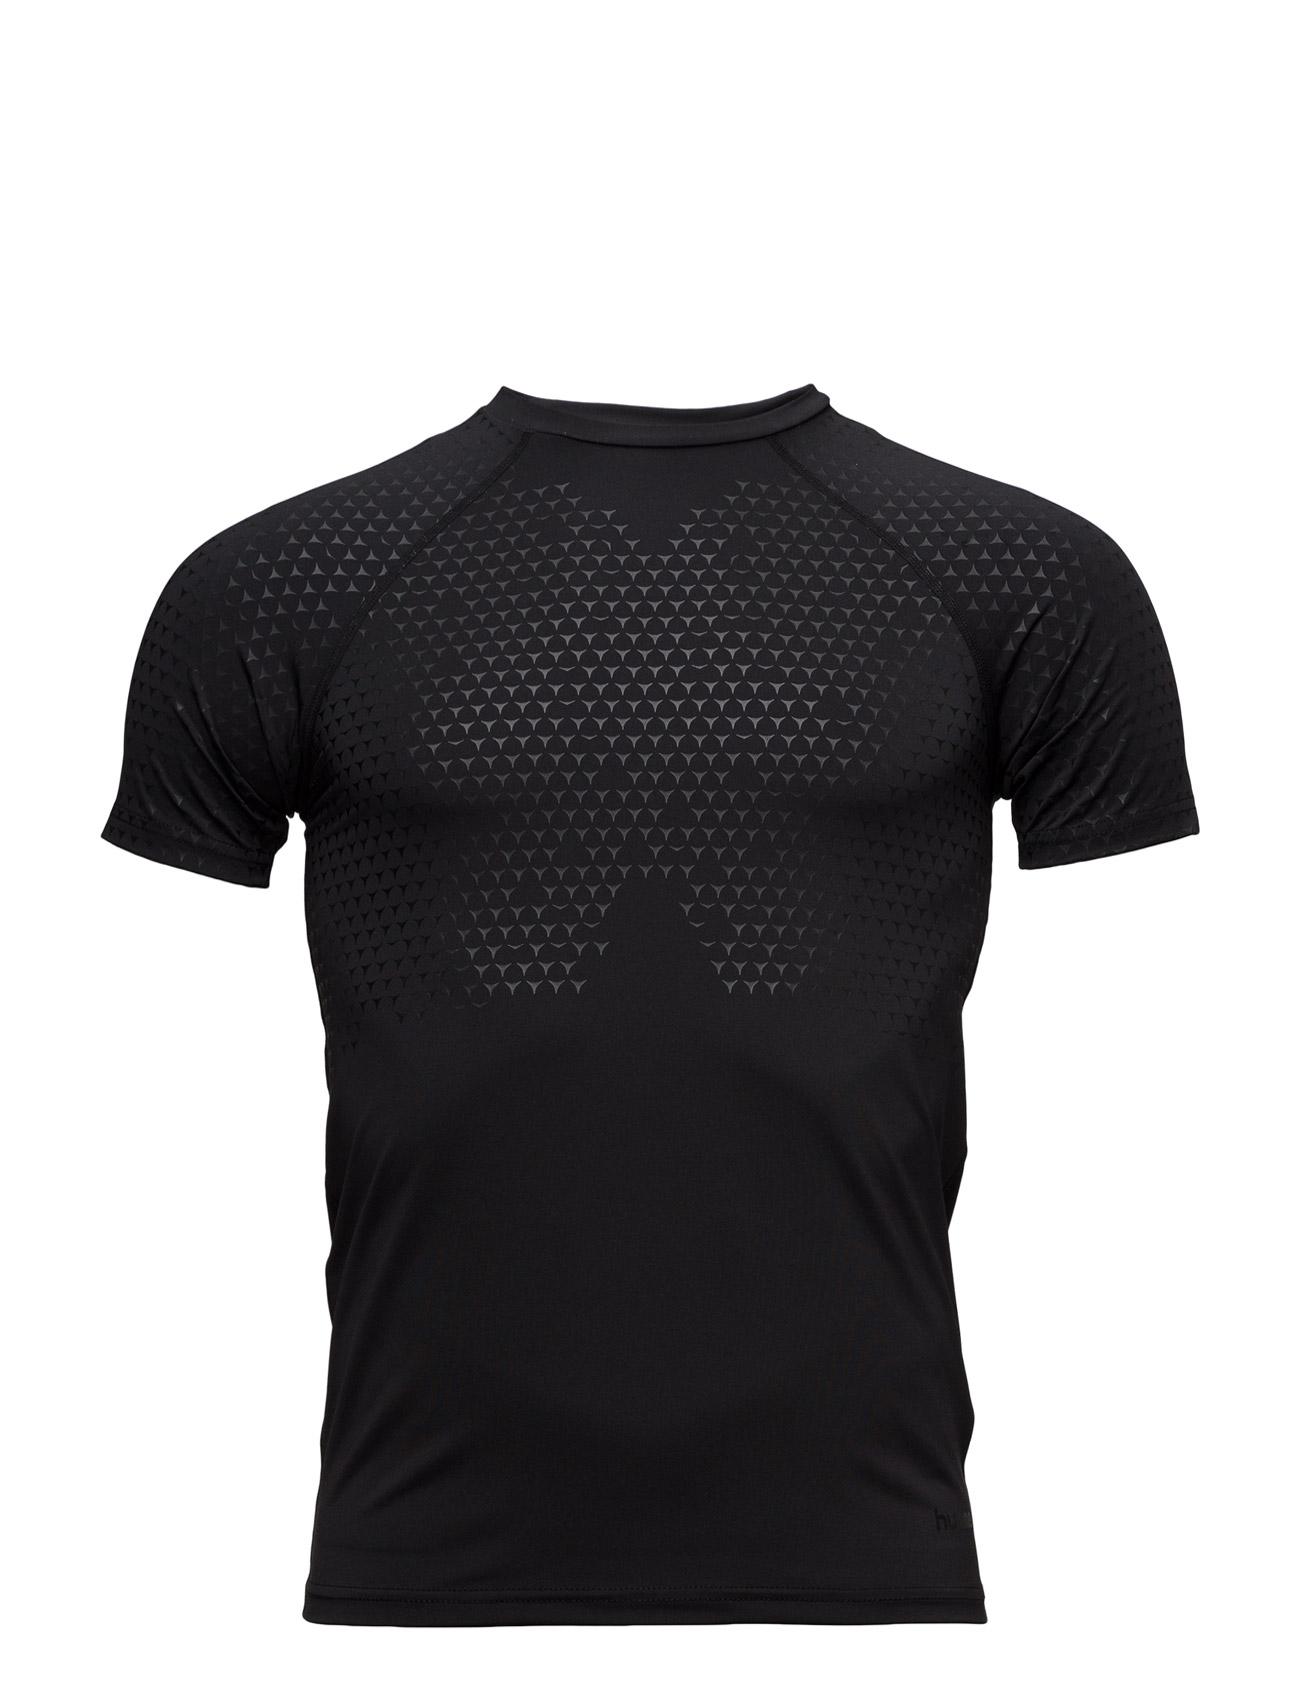 Remi Ss Tee Hummel Running T-Shirts